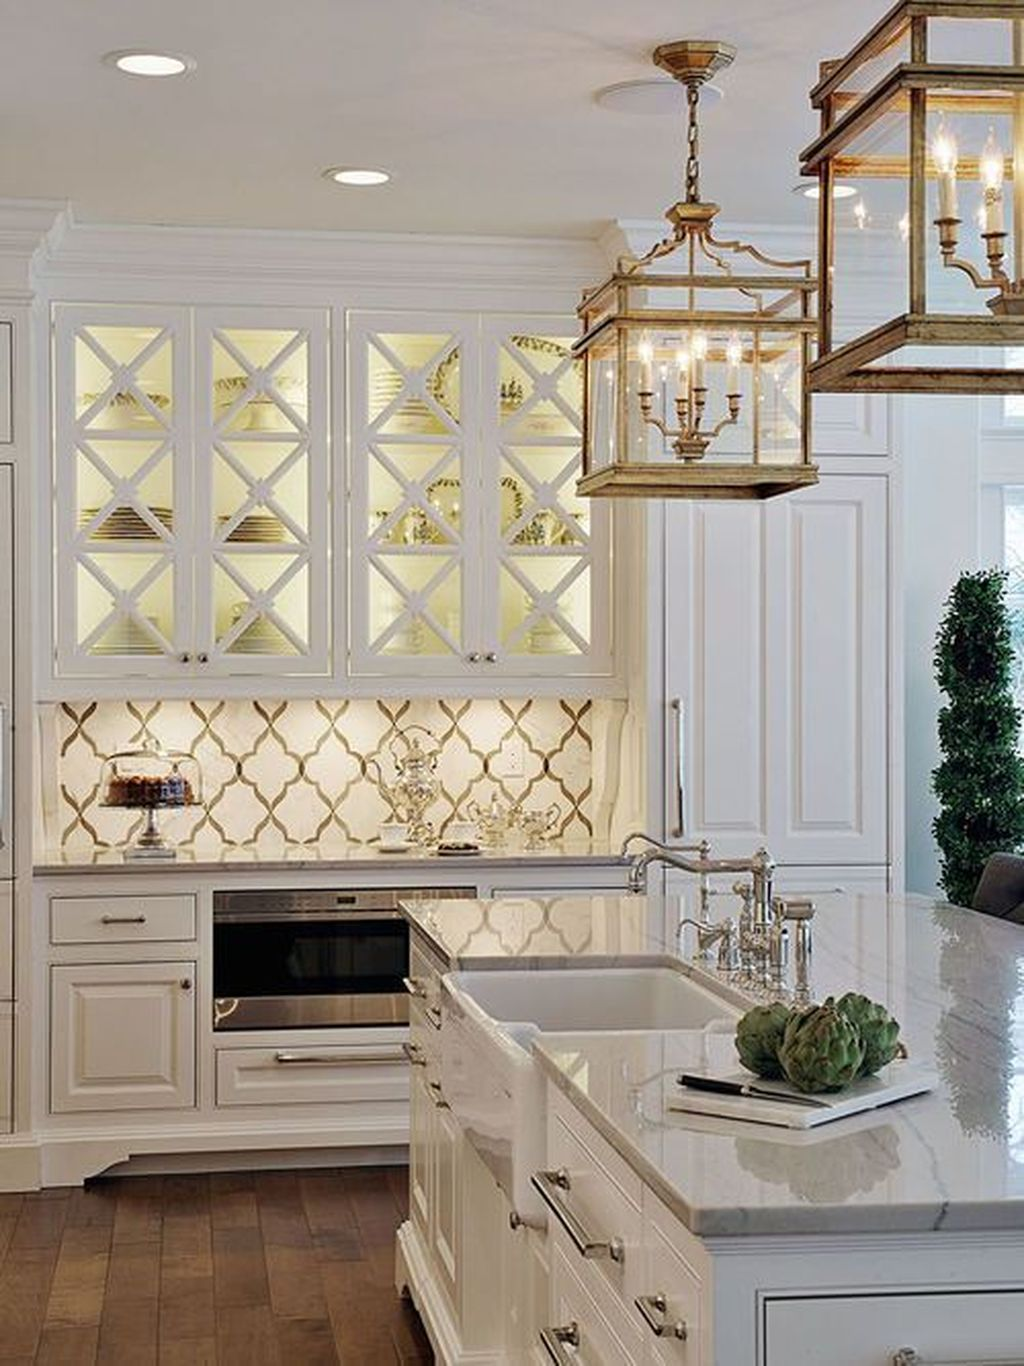 Wonderful Kitchen Lighting Ideas To Make It Look More Beautiful 24